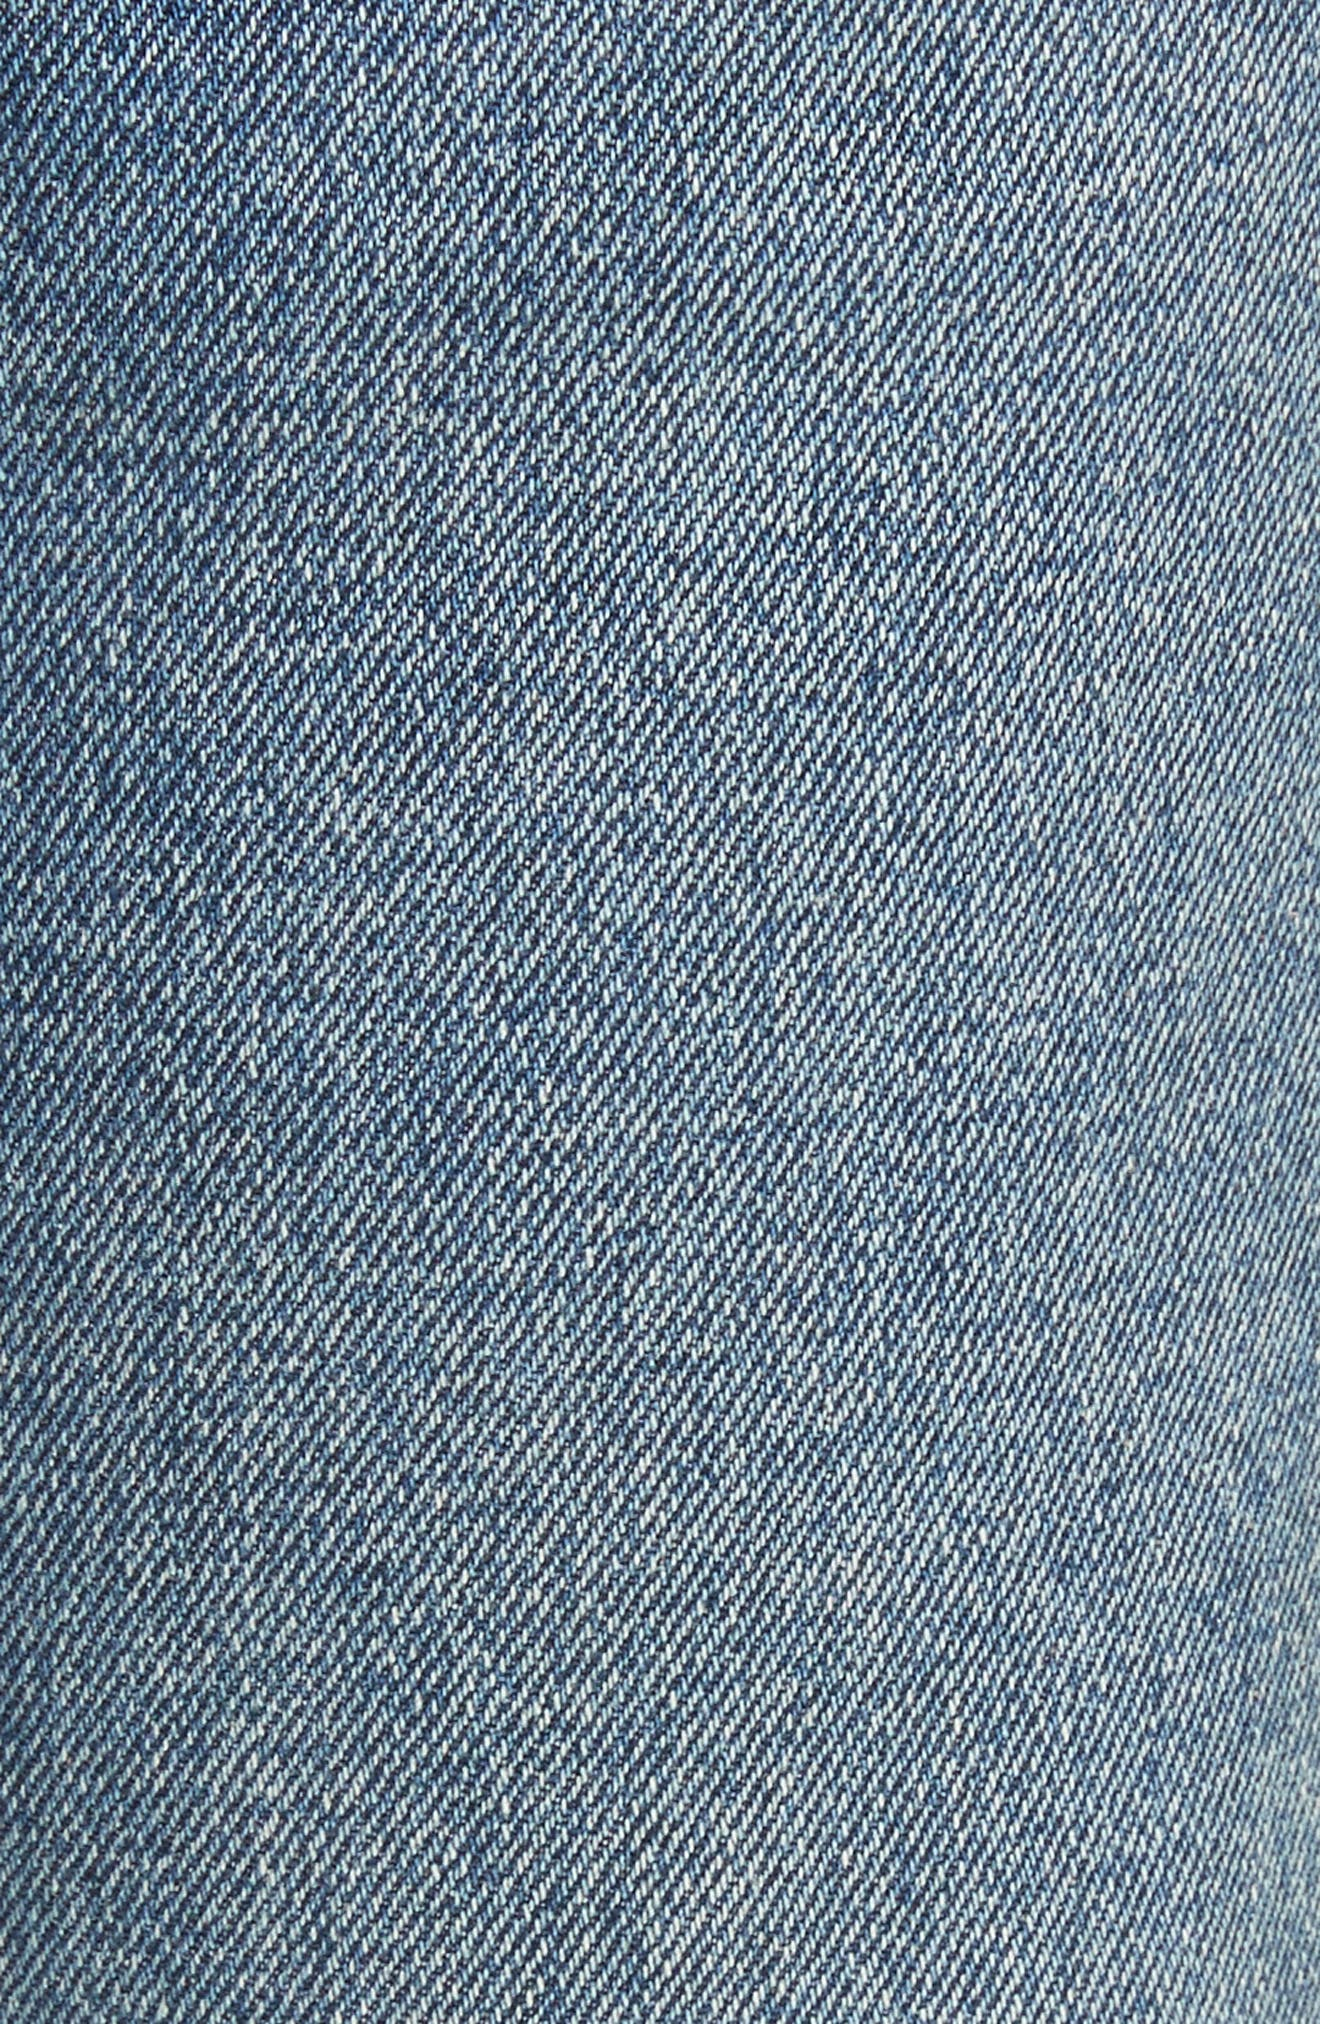 Linda Ripped Rigid High Waist Pop Crop Jeans,                             Alternate thumbnail 5, color,                             Zodiac